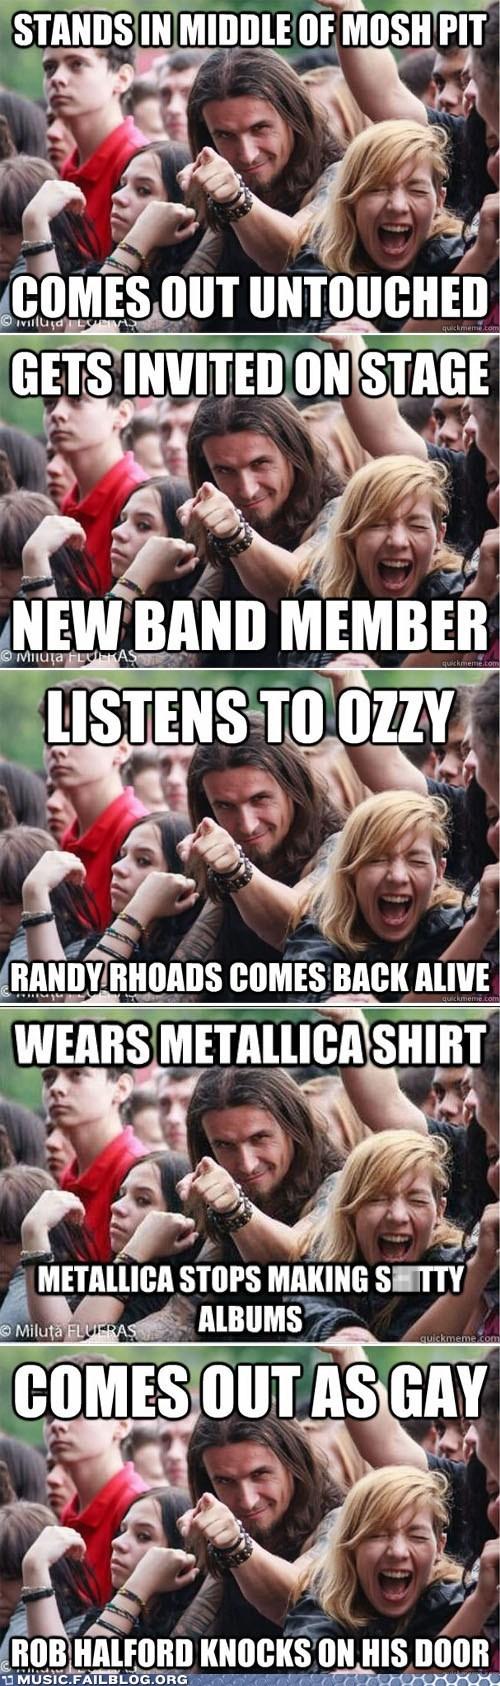 Music FAILS: Ridiculously Photogenic Metalhead